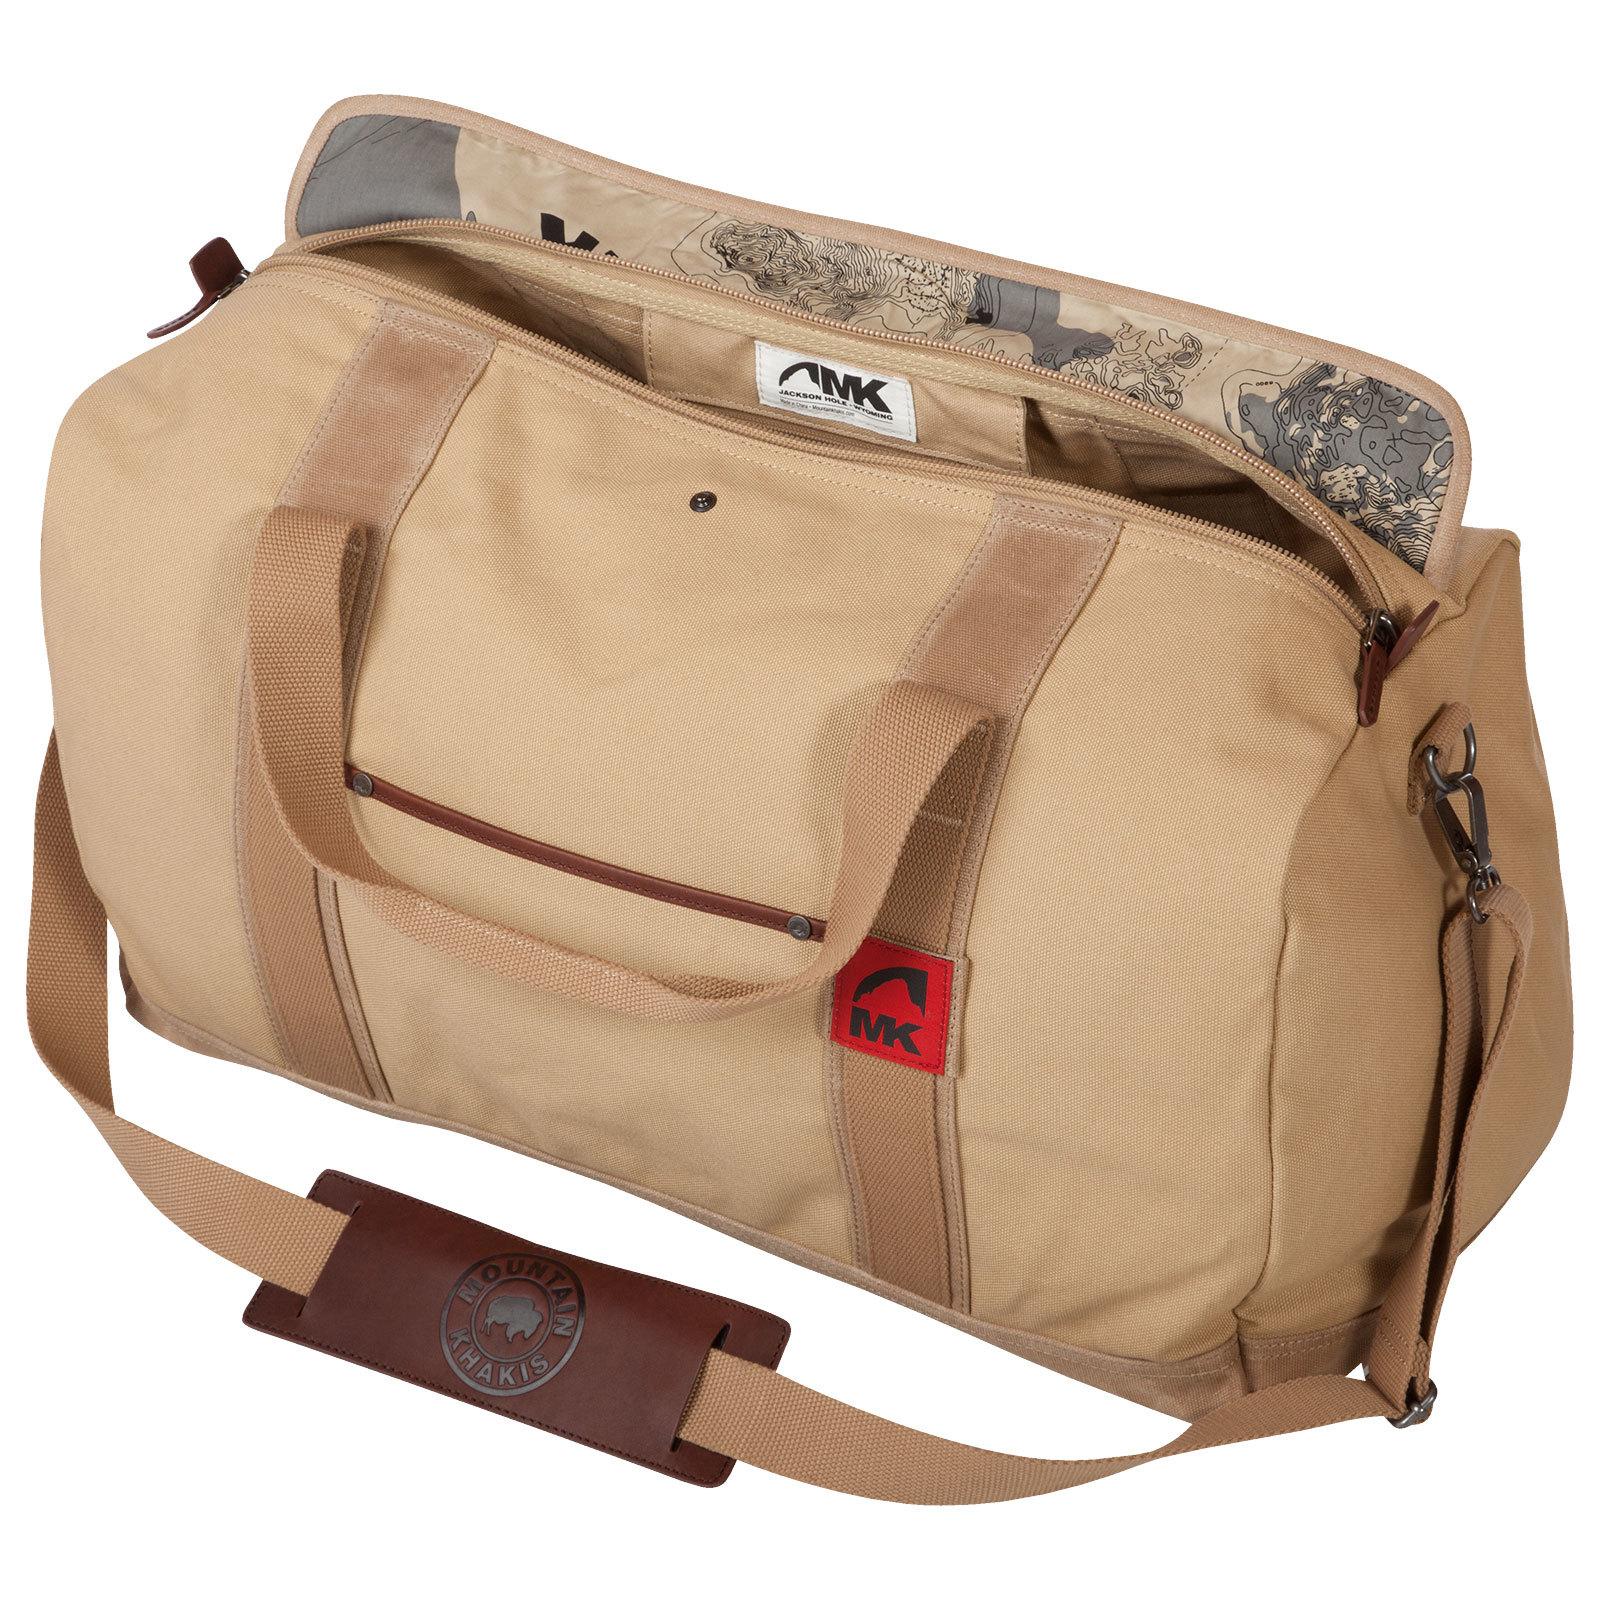 7f5da995eed8 Small Outdoor Canvas Duffle Bag - Mountain Khakis